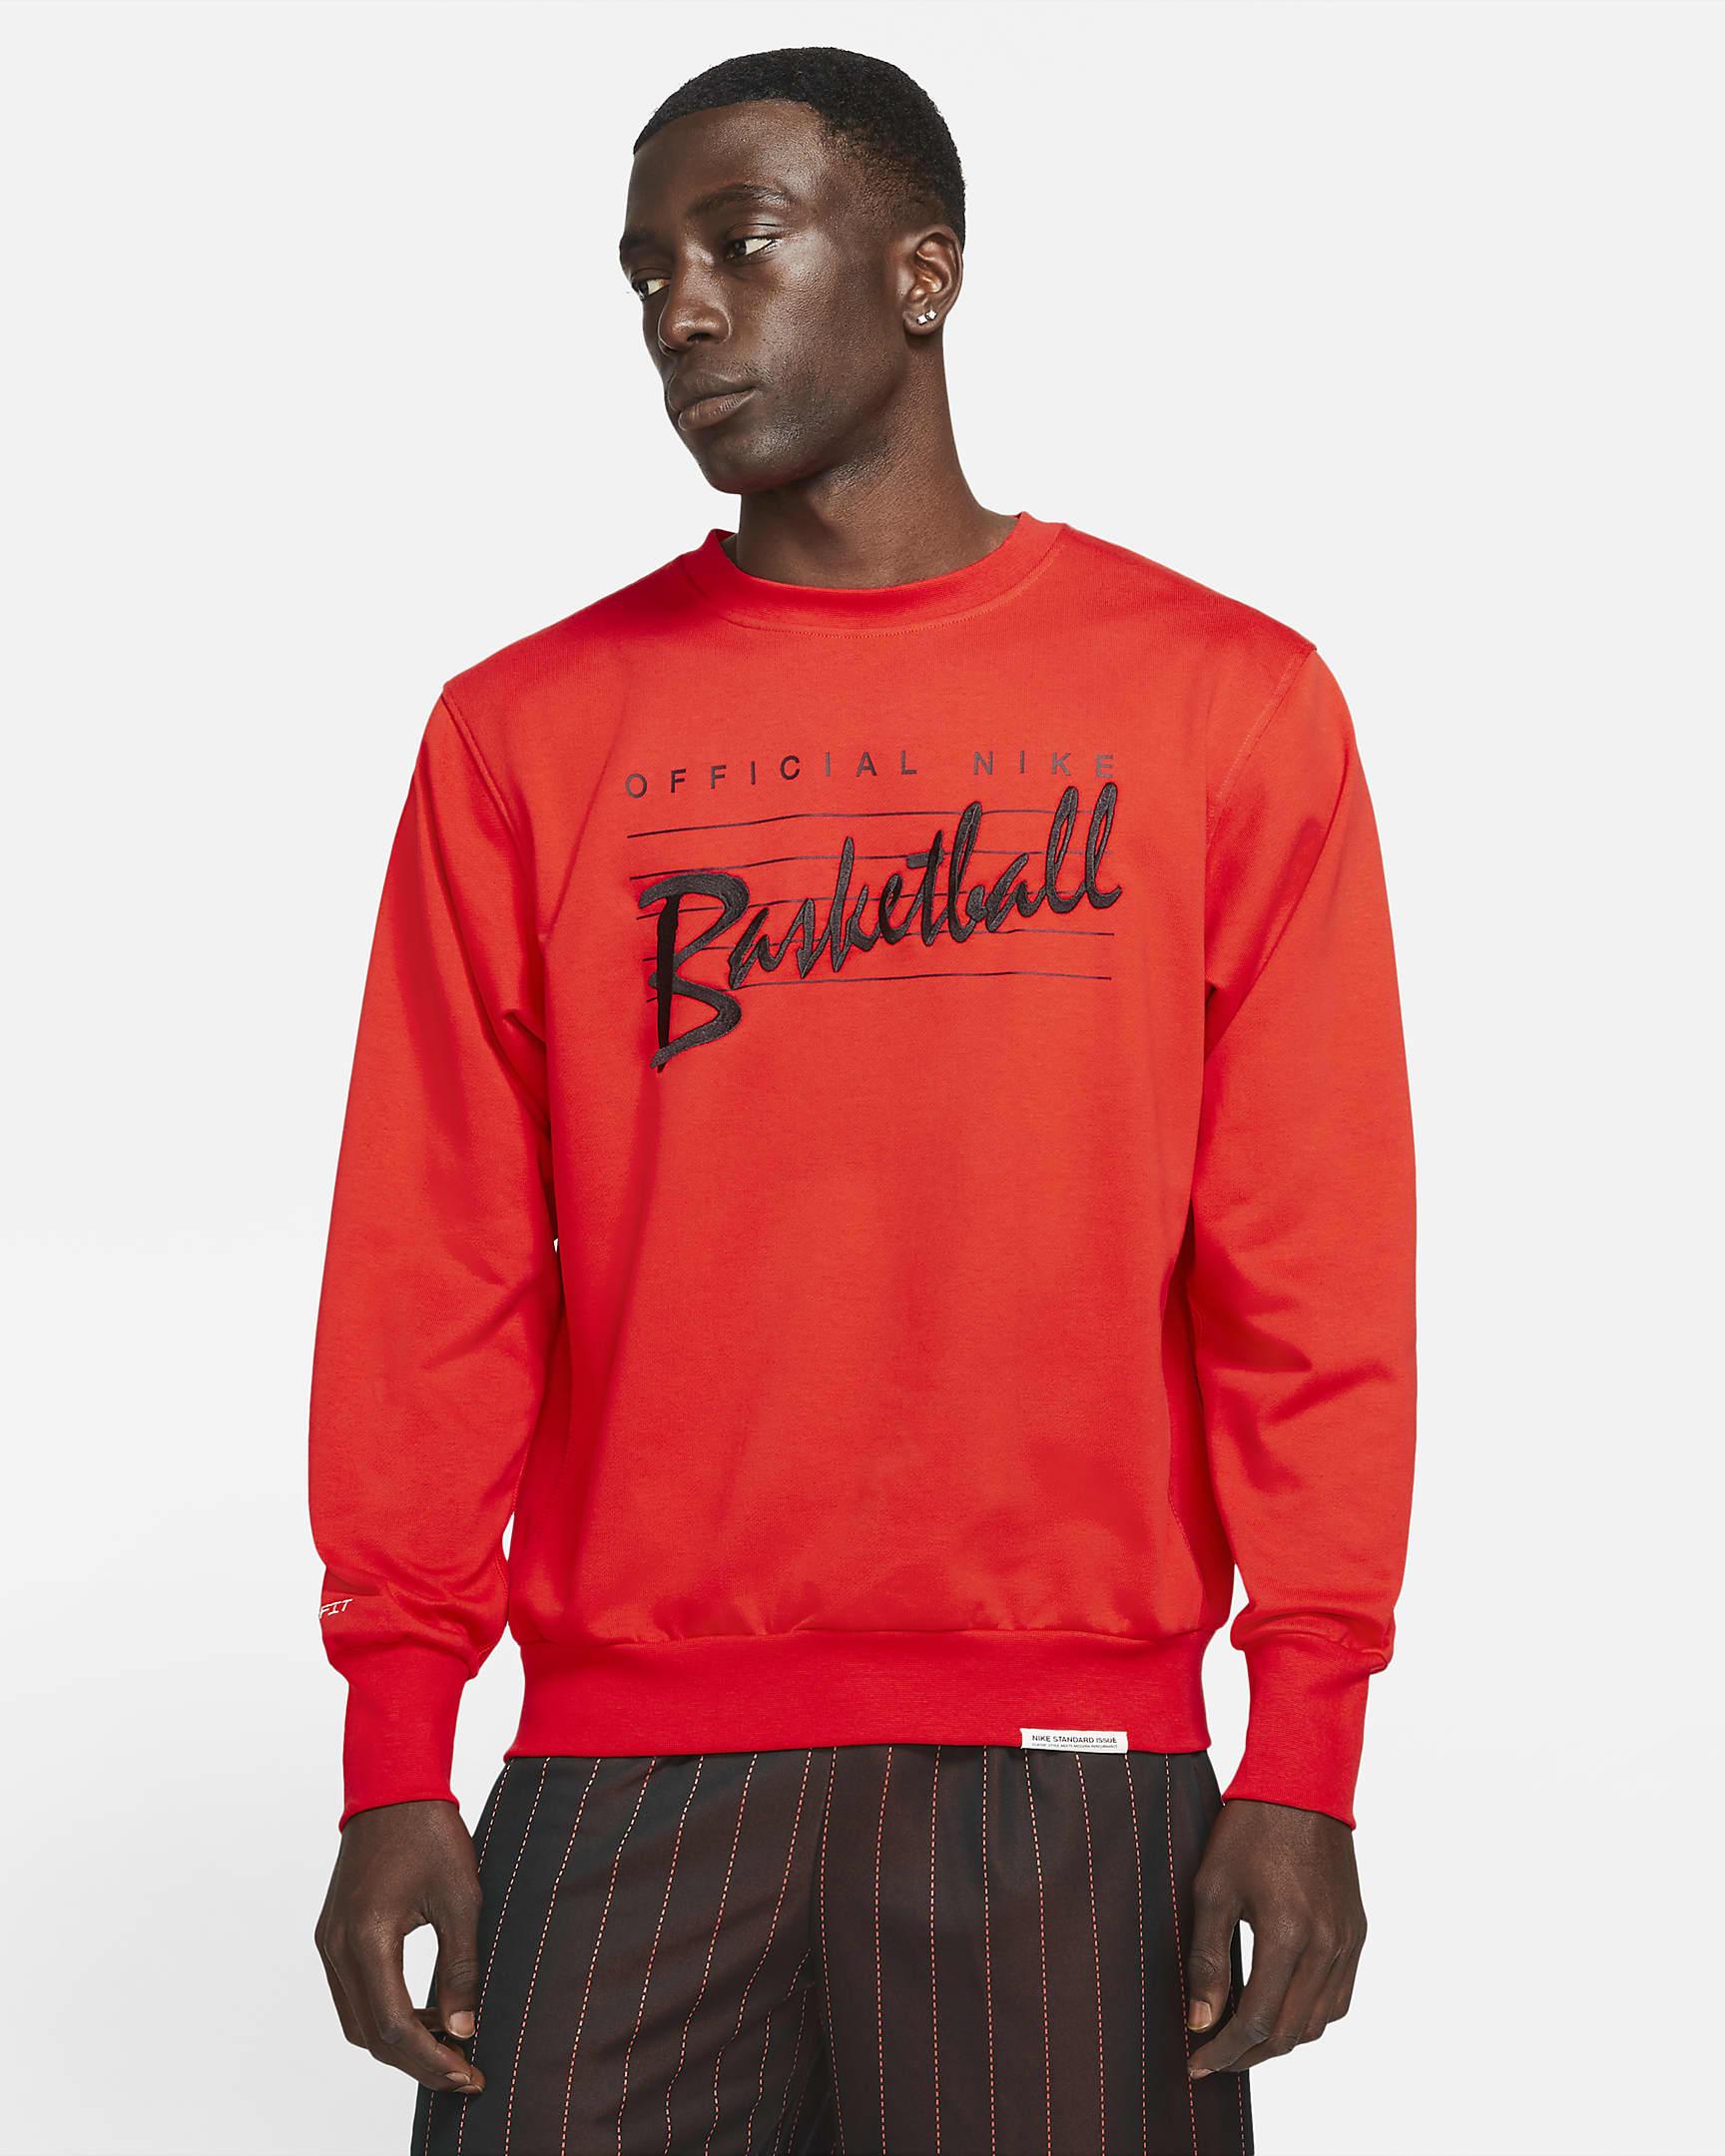 nike-dri-fit-standard-issue-mens-basketball-sweatshirt-pbTB3s.png